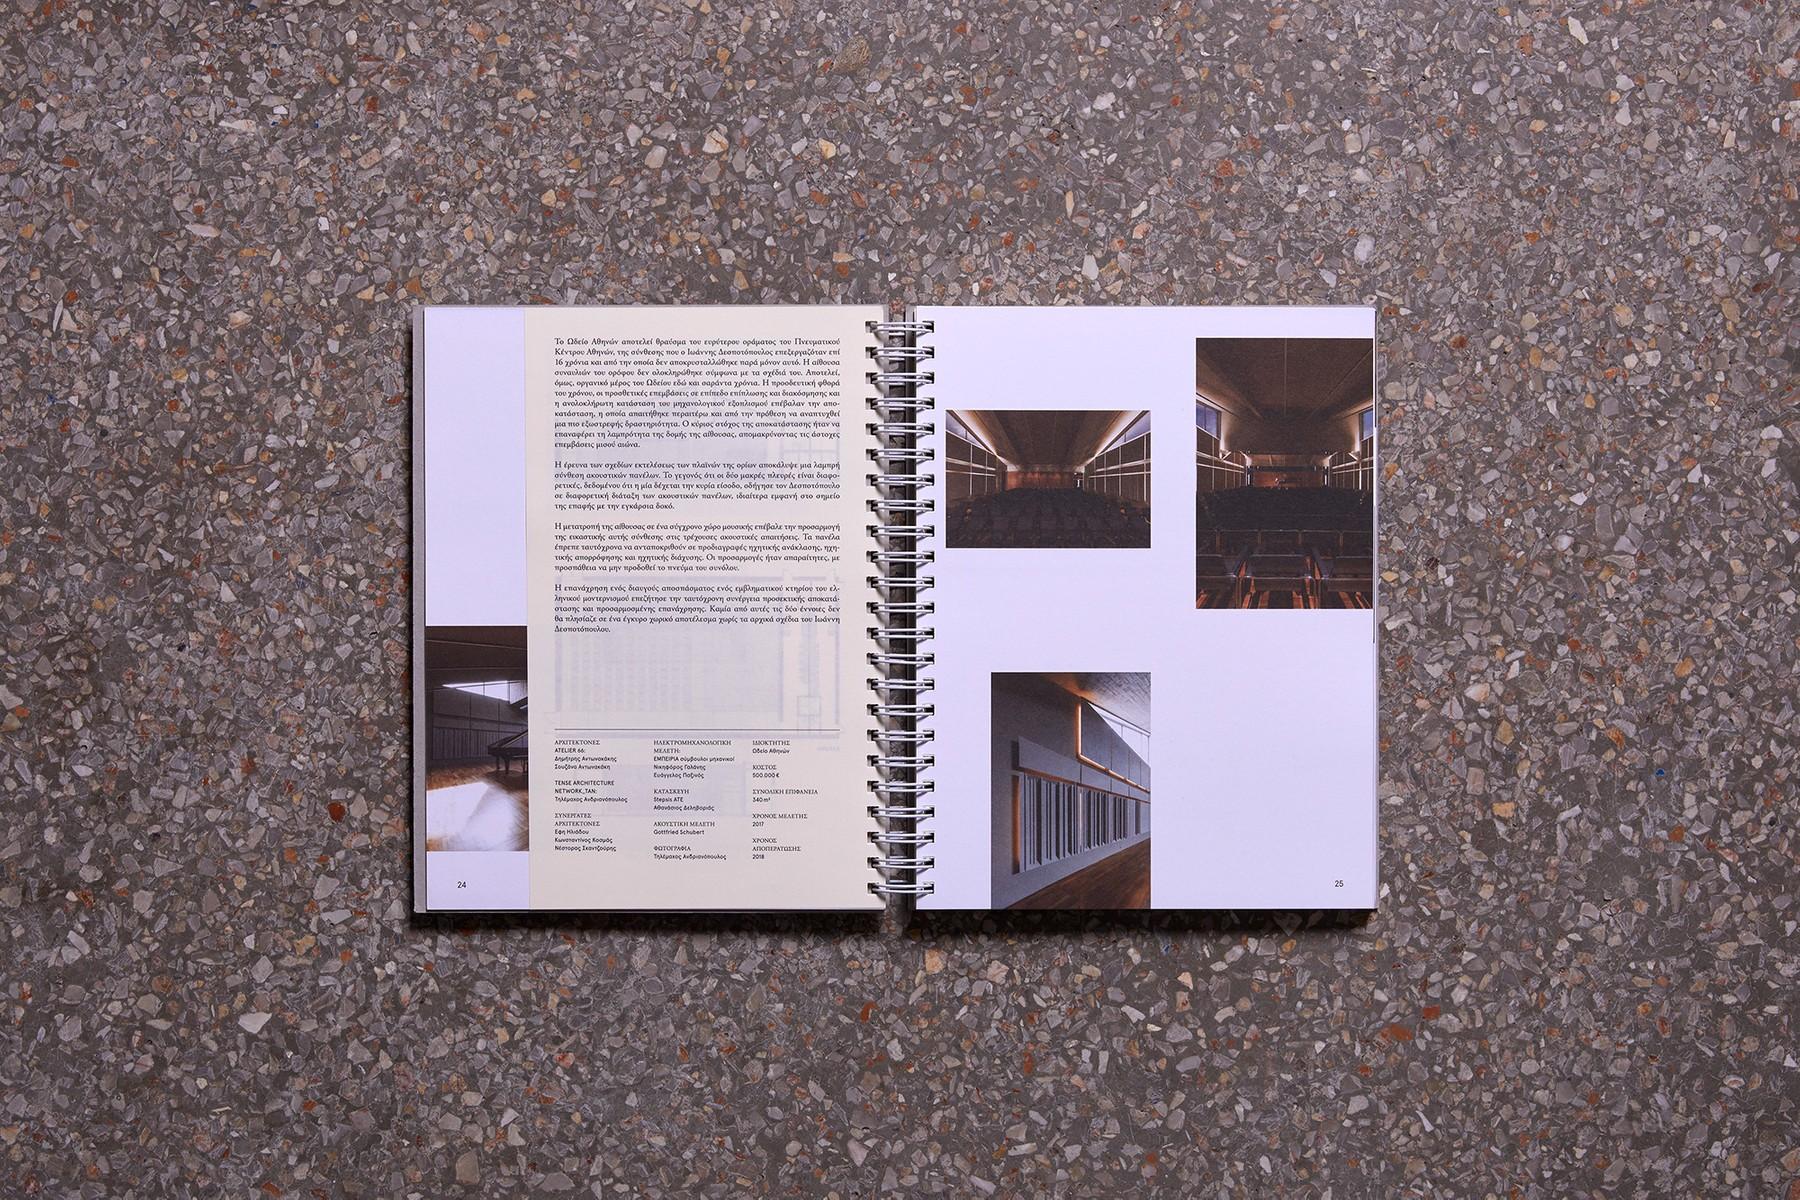 greek-architecture-nowhere-6.jpg